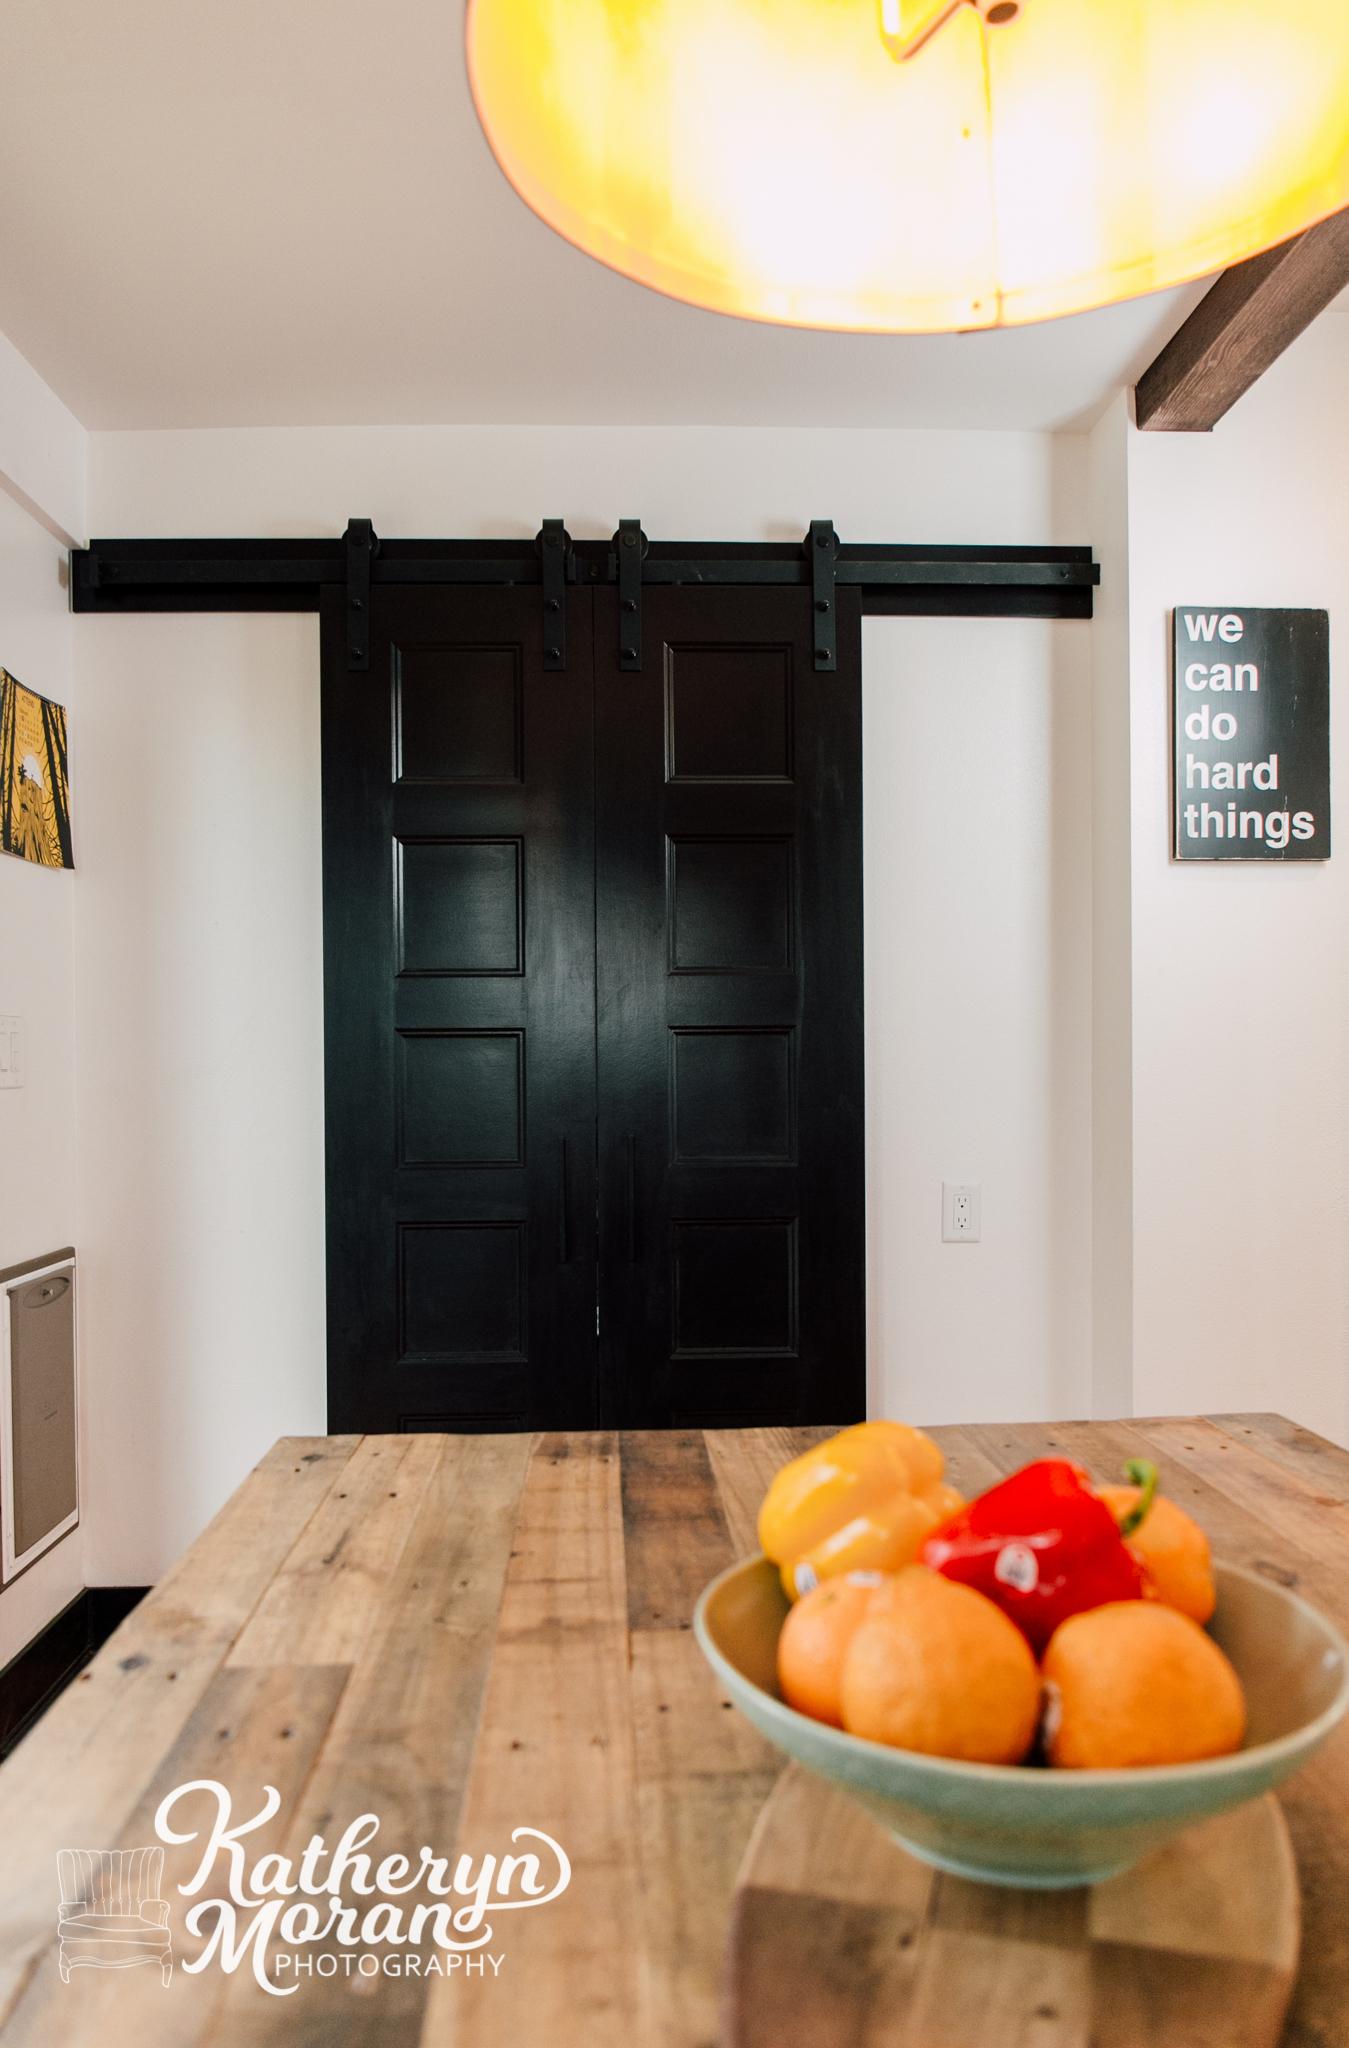 bellingham-photographer-katheryn-moran-jennifer-ryan-designs-interior-design-ferndale-kitchen-2019-1-9.jpg